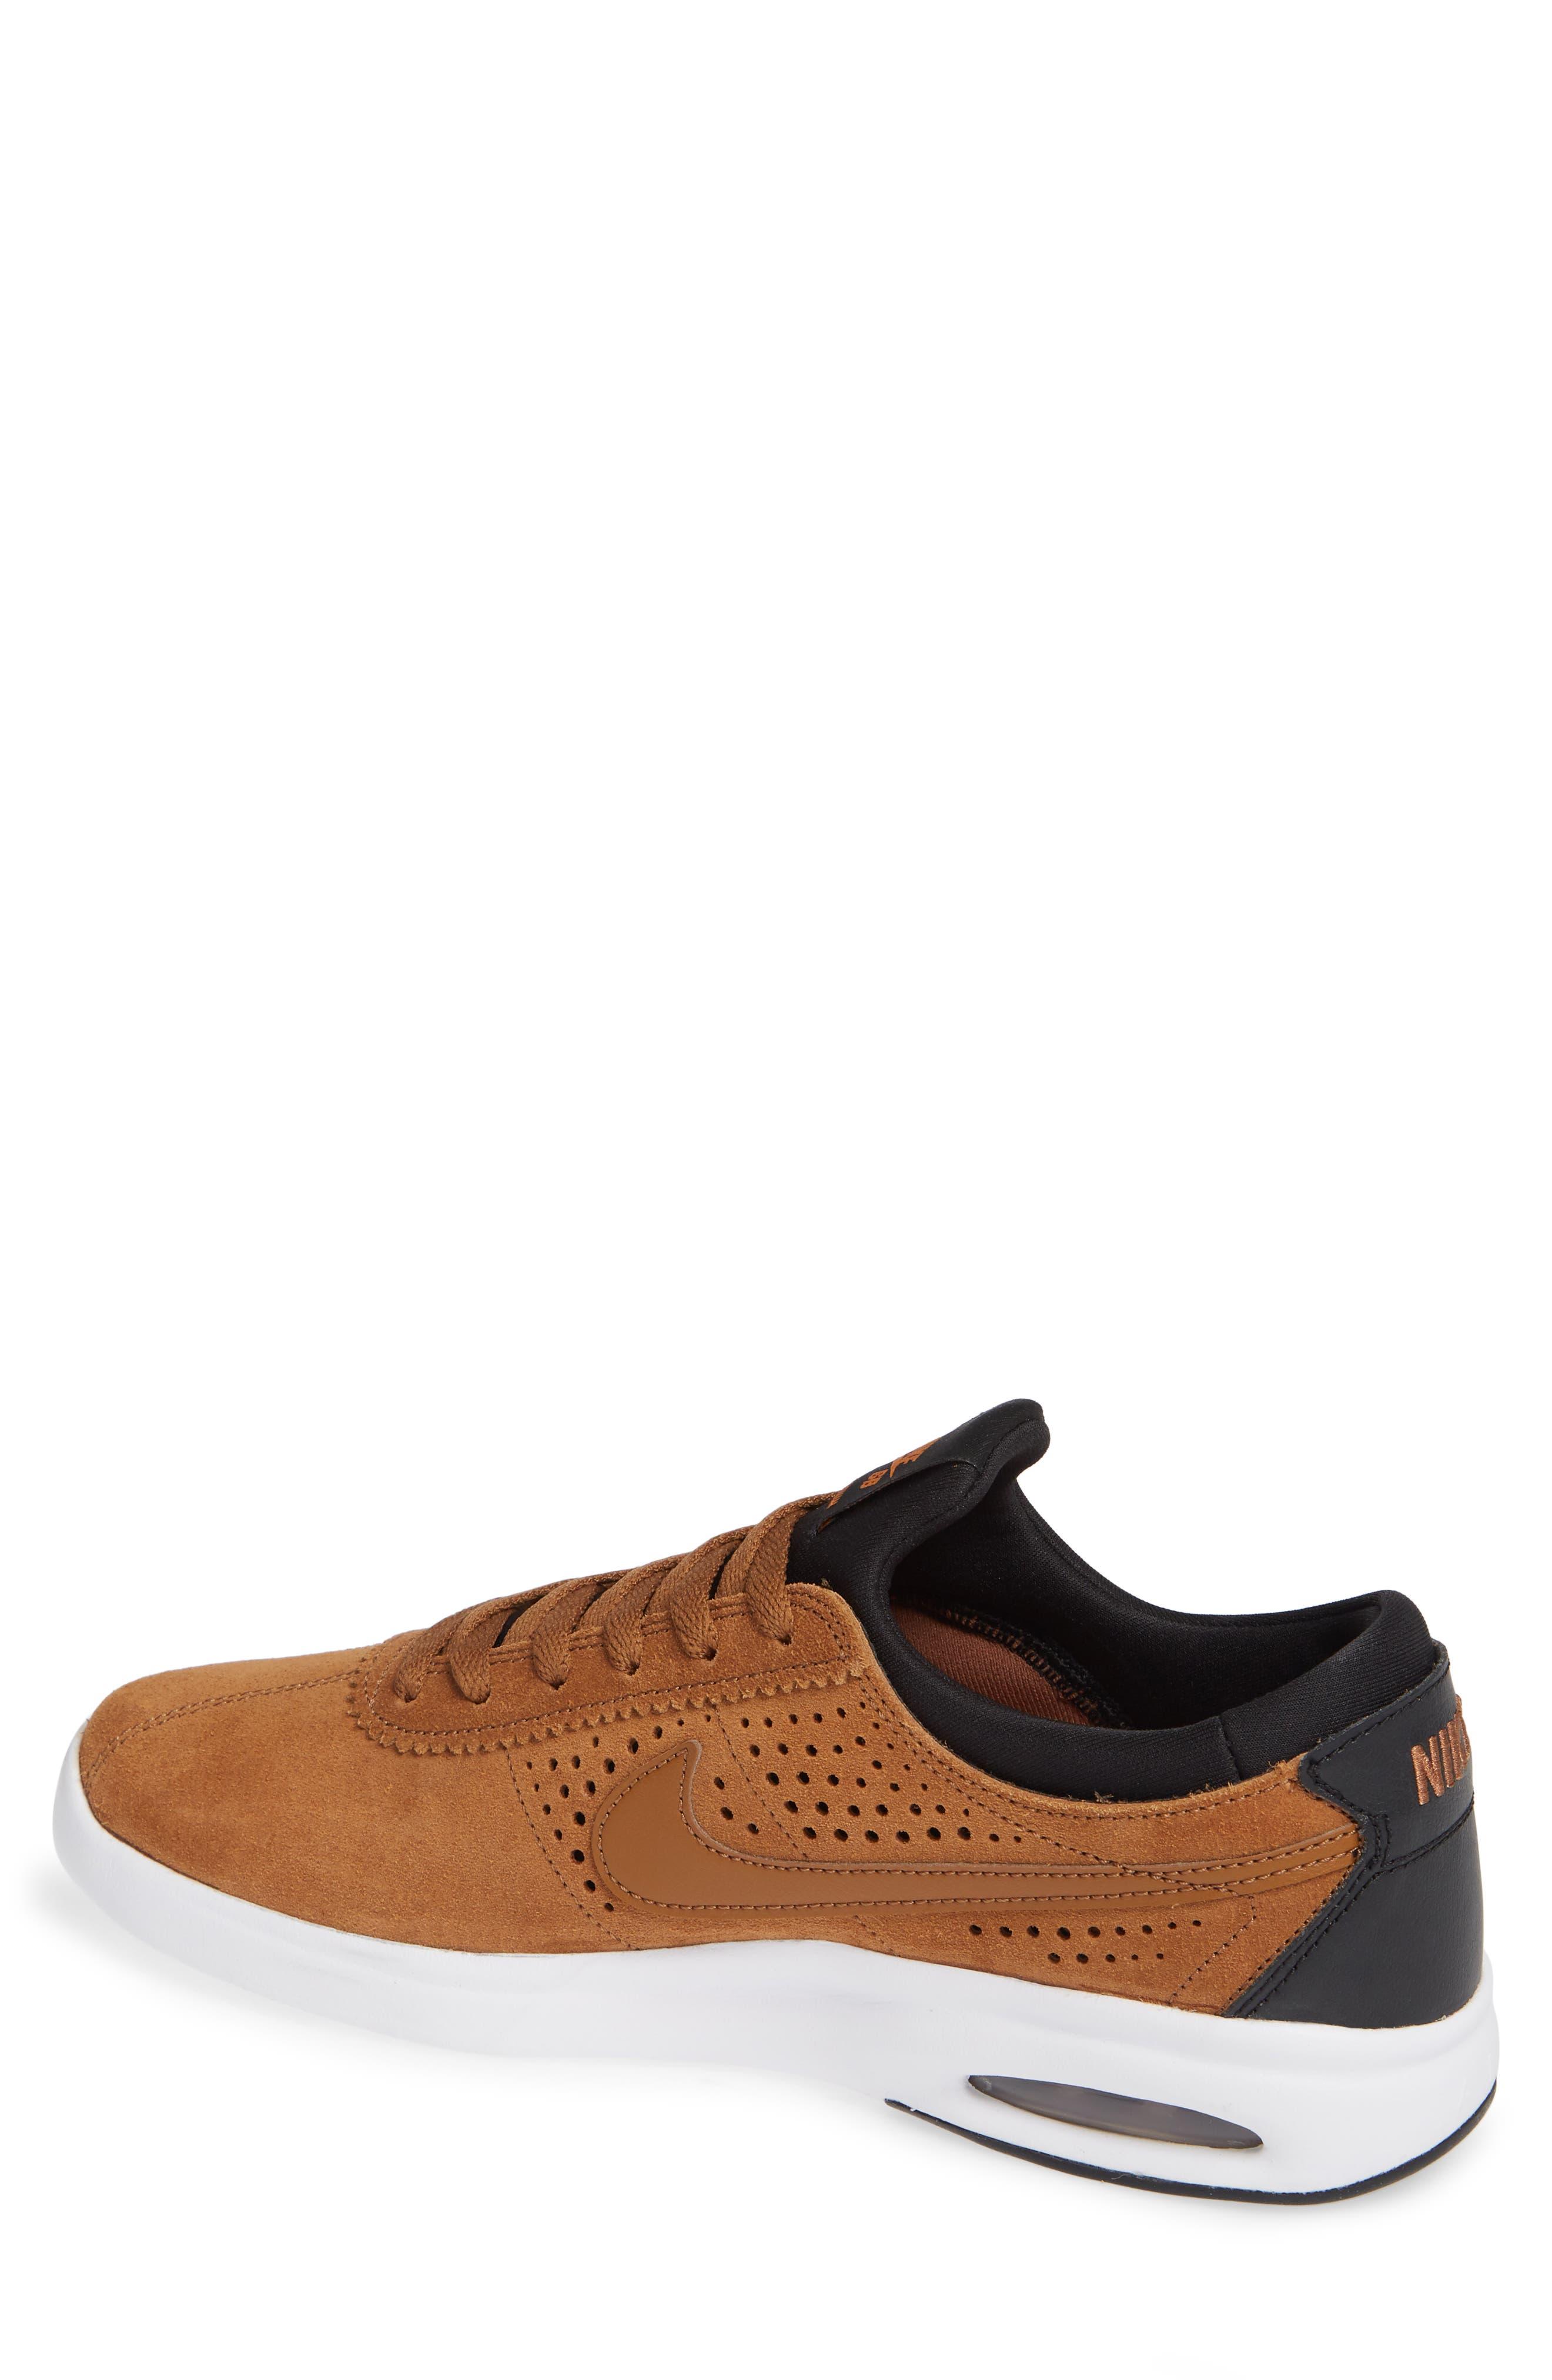 SB Air Max Bruin Vapor Skateboarding Sneaker,                             Alternate thumbnail 2, color,                             British Tan/ Black/ Monarch